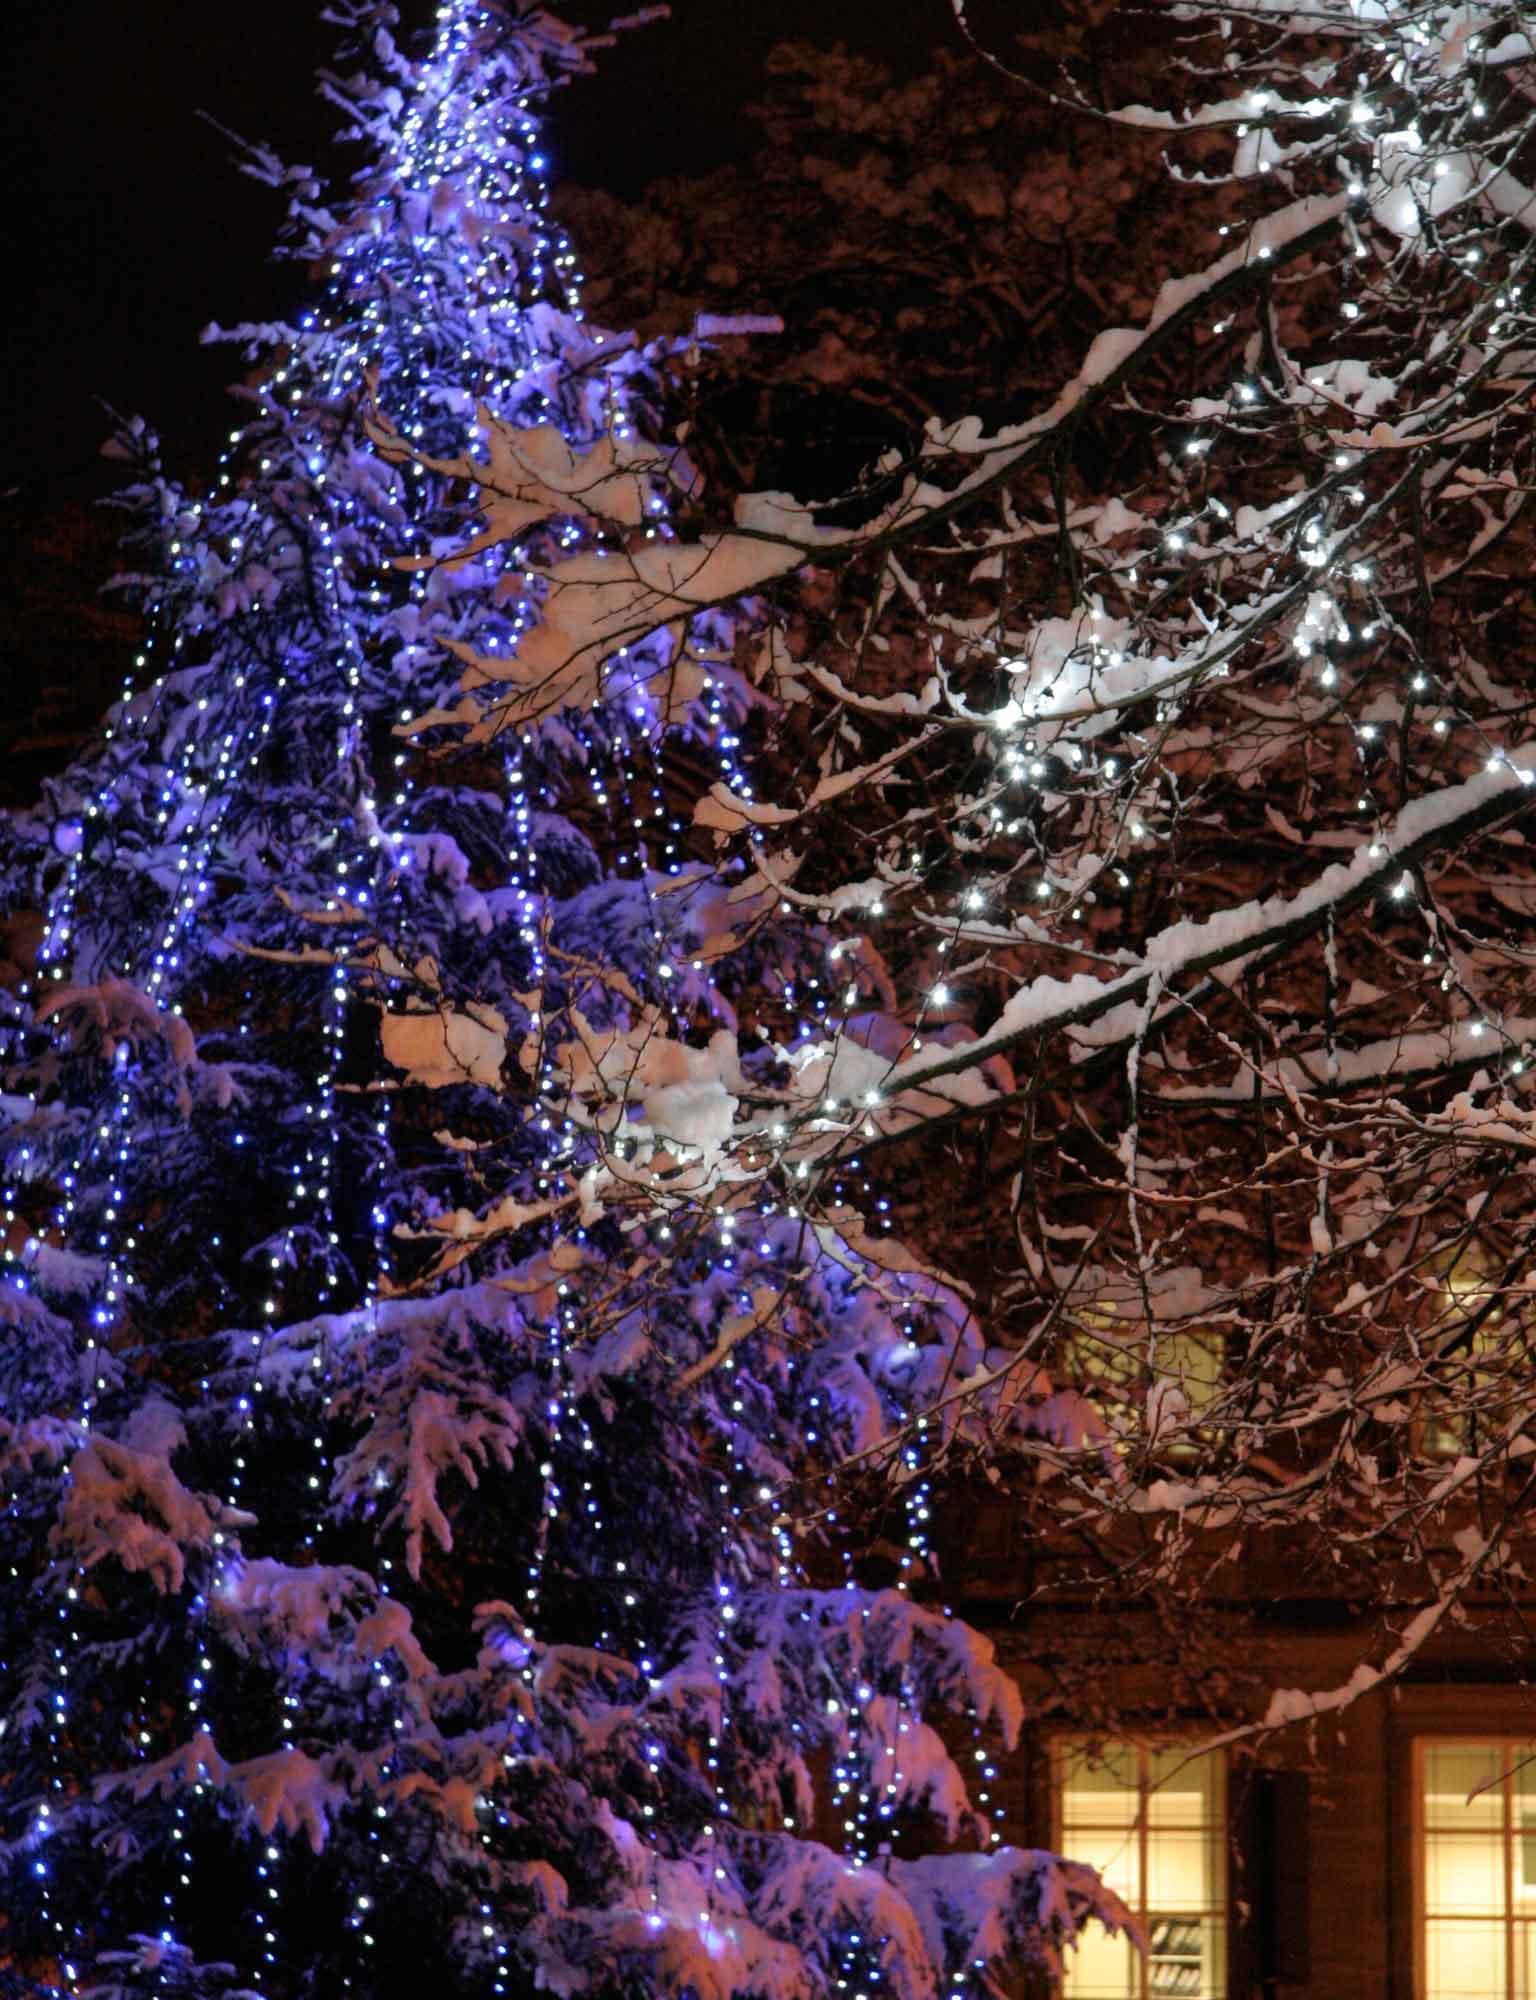 Purple Christmas Tree Lights.Christmas Tree Light Ideas Lights4fun Co Uk